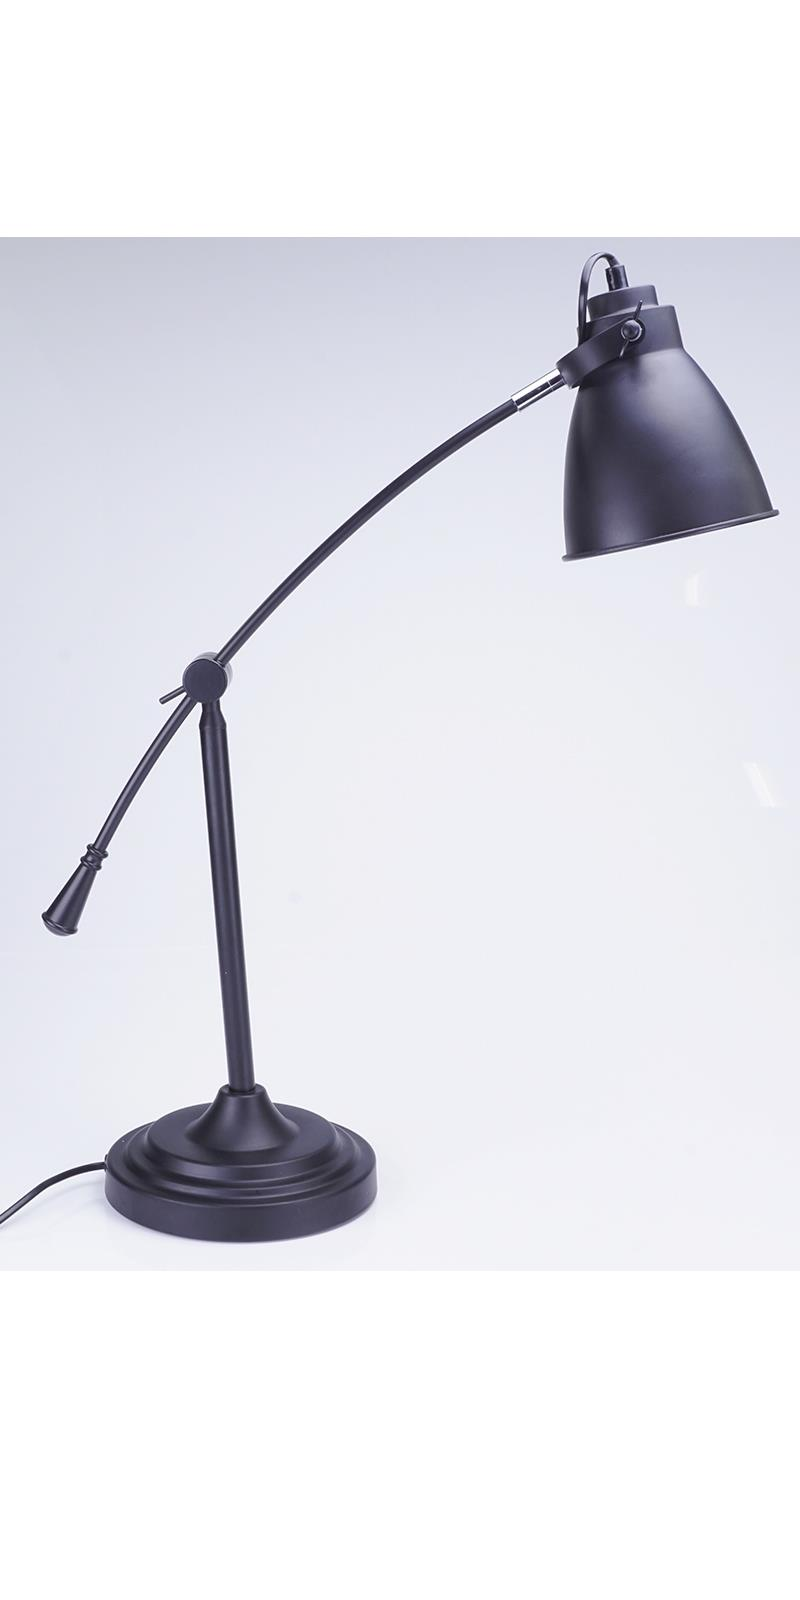 tischleuchte led metall schwarz livarno lux tischlampe. Black Bedroom Furniture Sets. Home Design Ideas